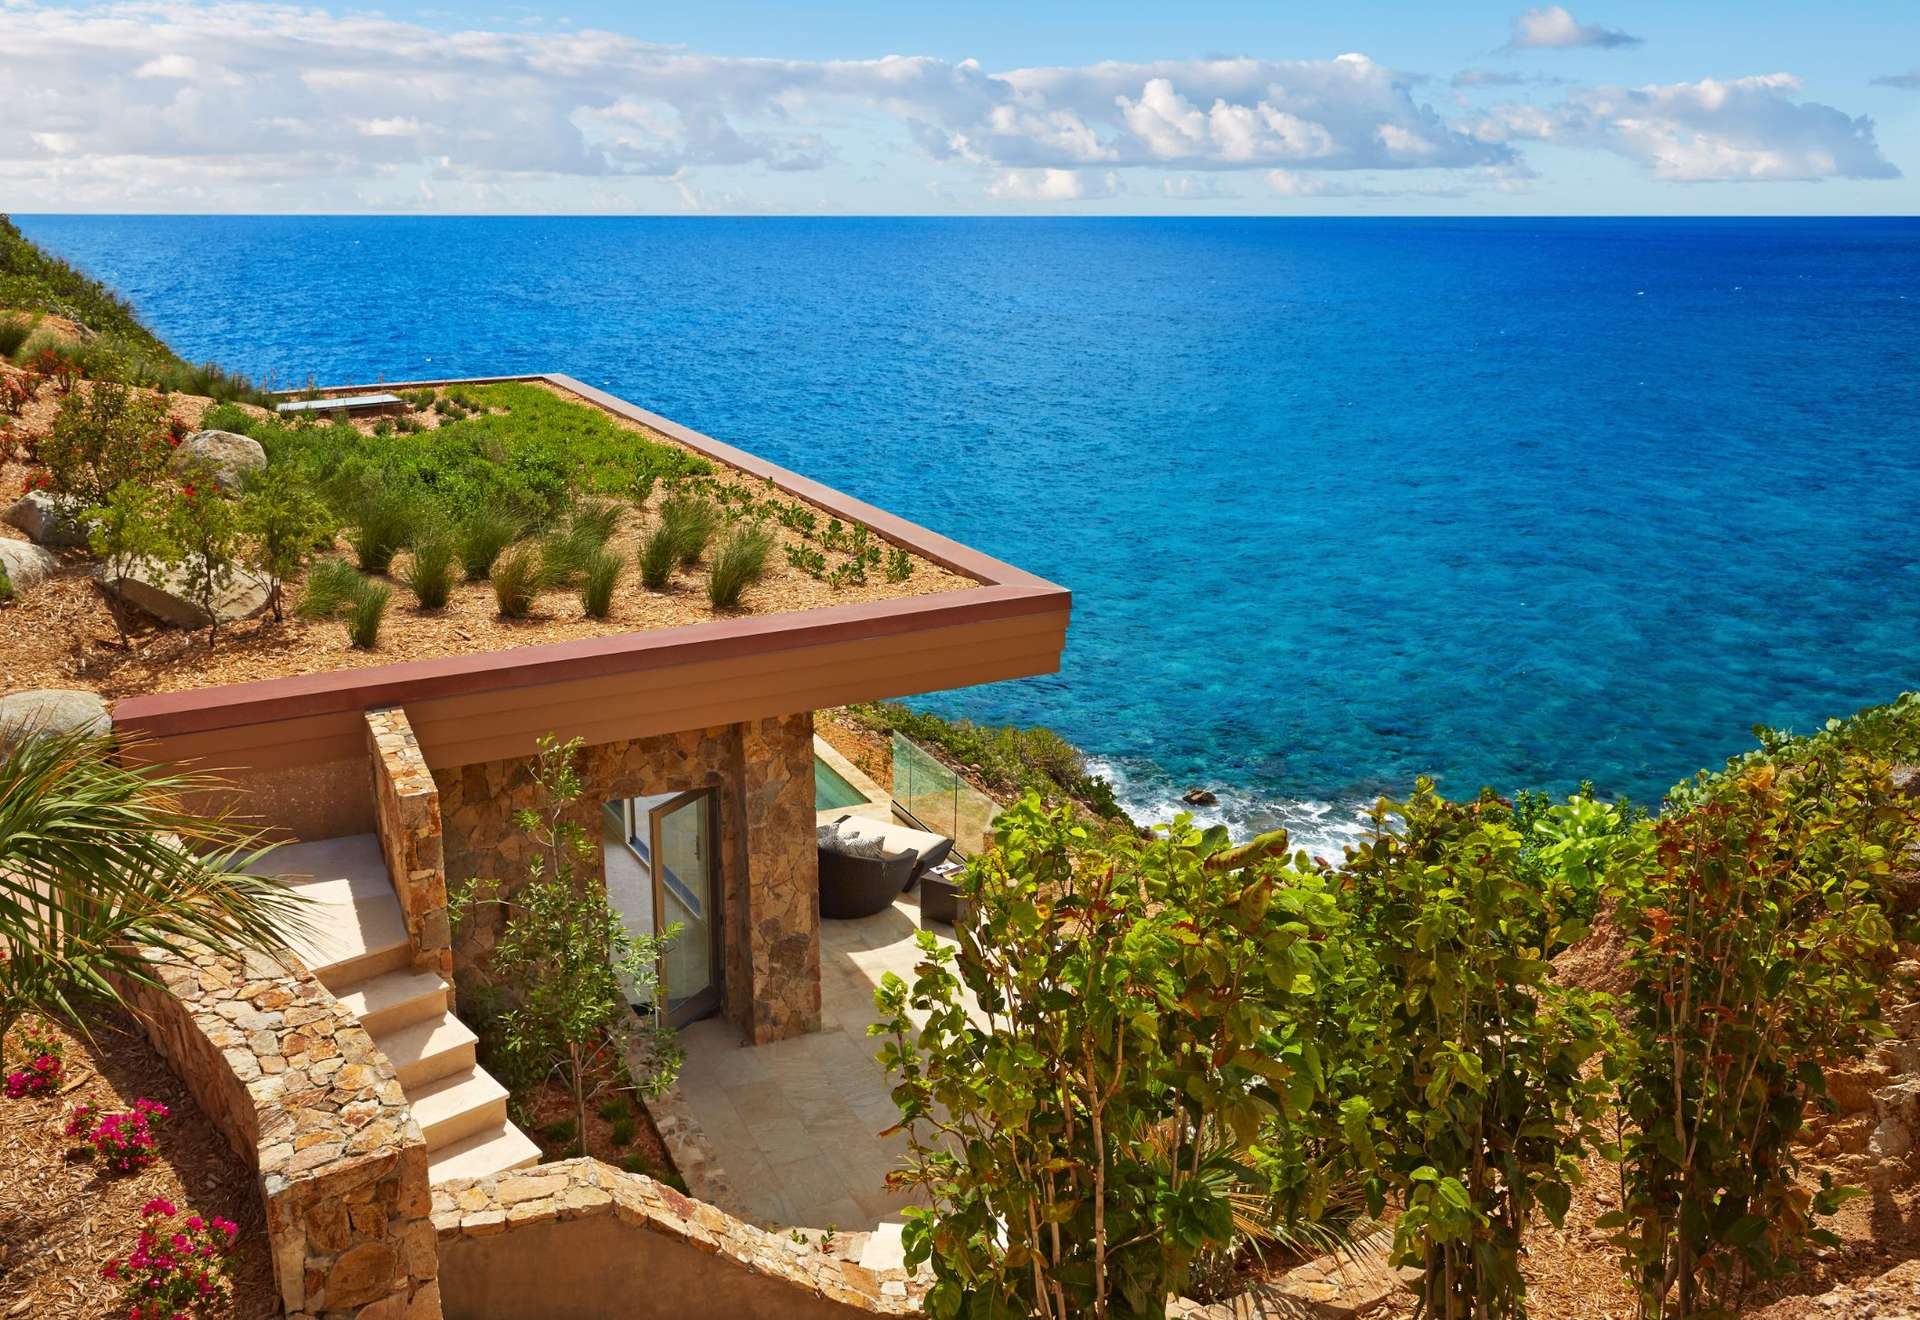 Luxury villa rentals caribbean - British virgin islands - Virgin gorda - Oil nutbay - The Cliff Suites - Image 1/8